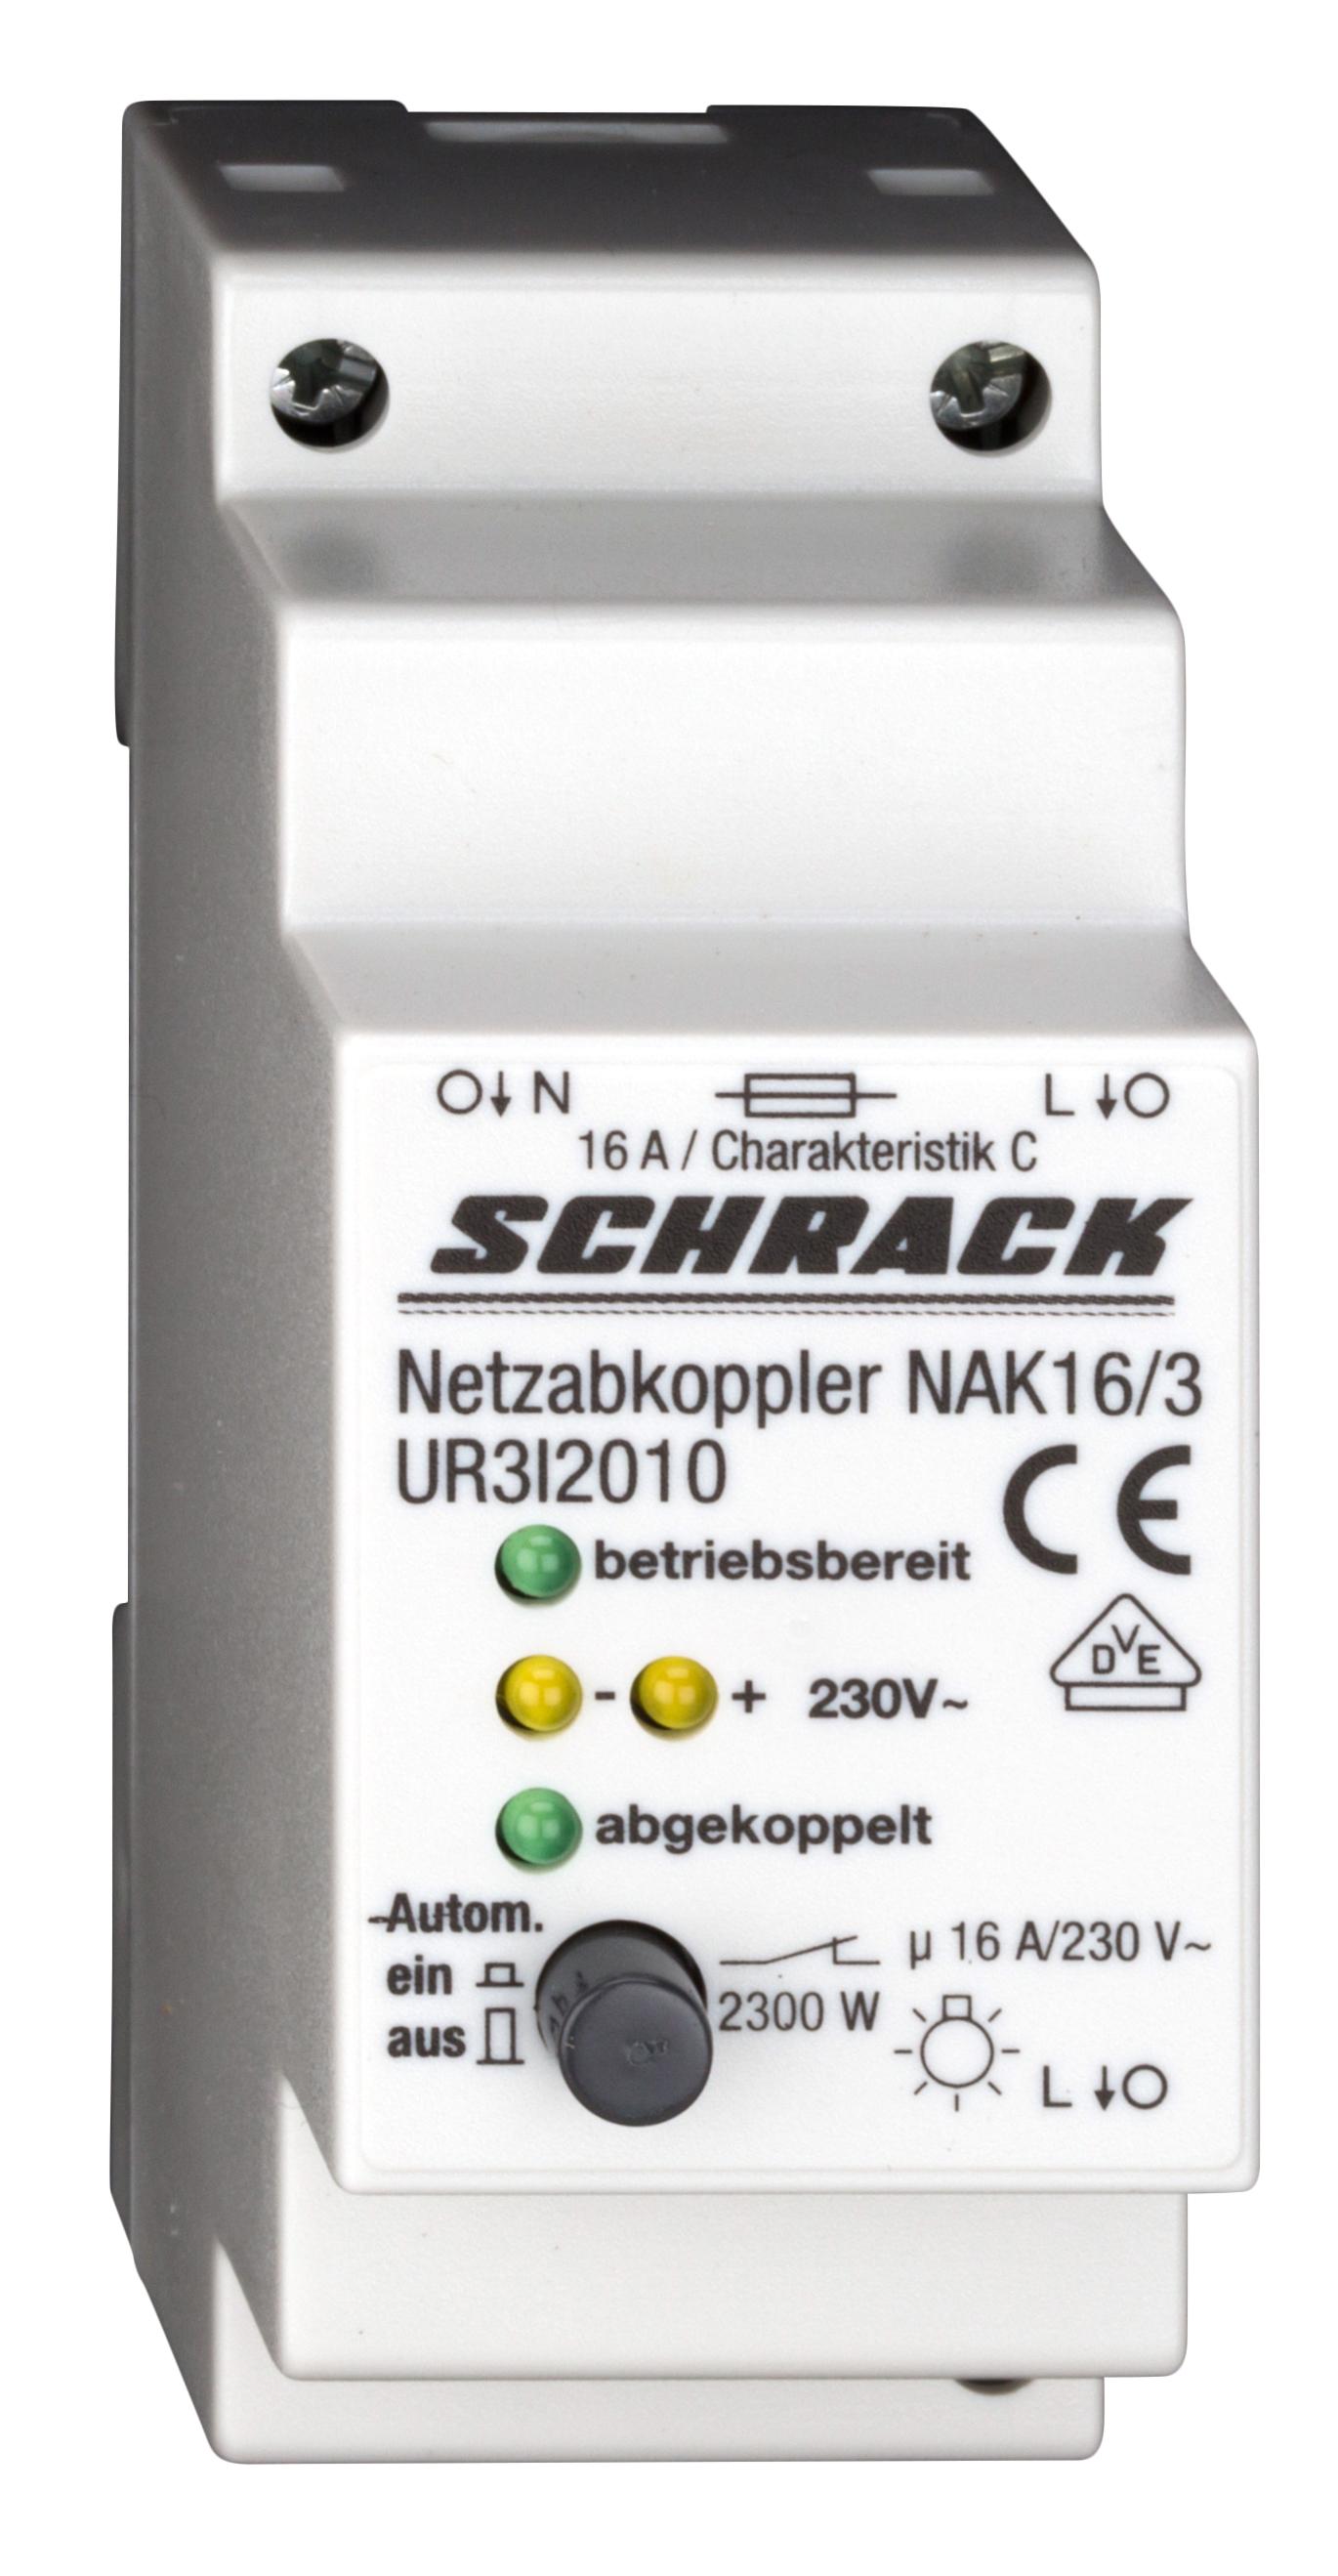 1 Stk Netzabkoppler 230VAC ± 10%, 16A, 2300W Glühlampenlast UR3I2010--